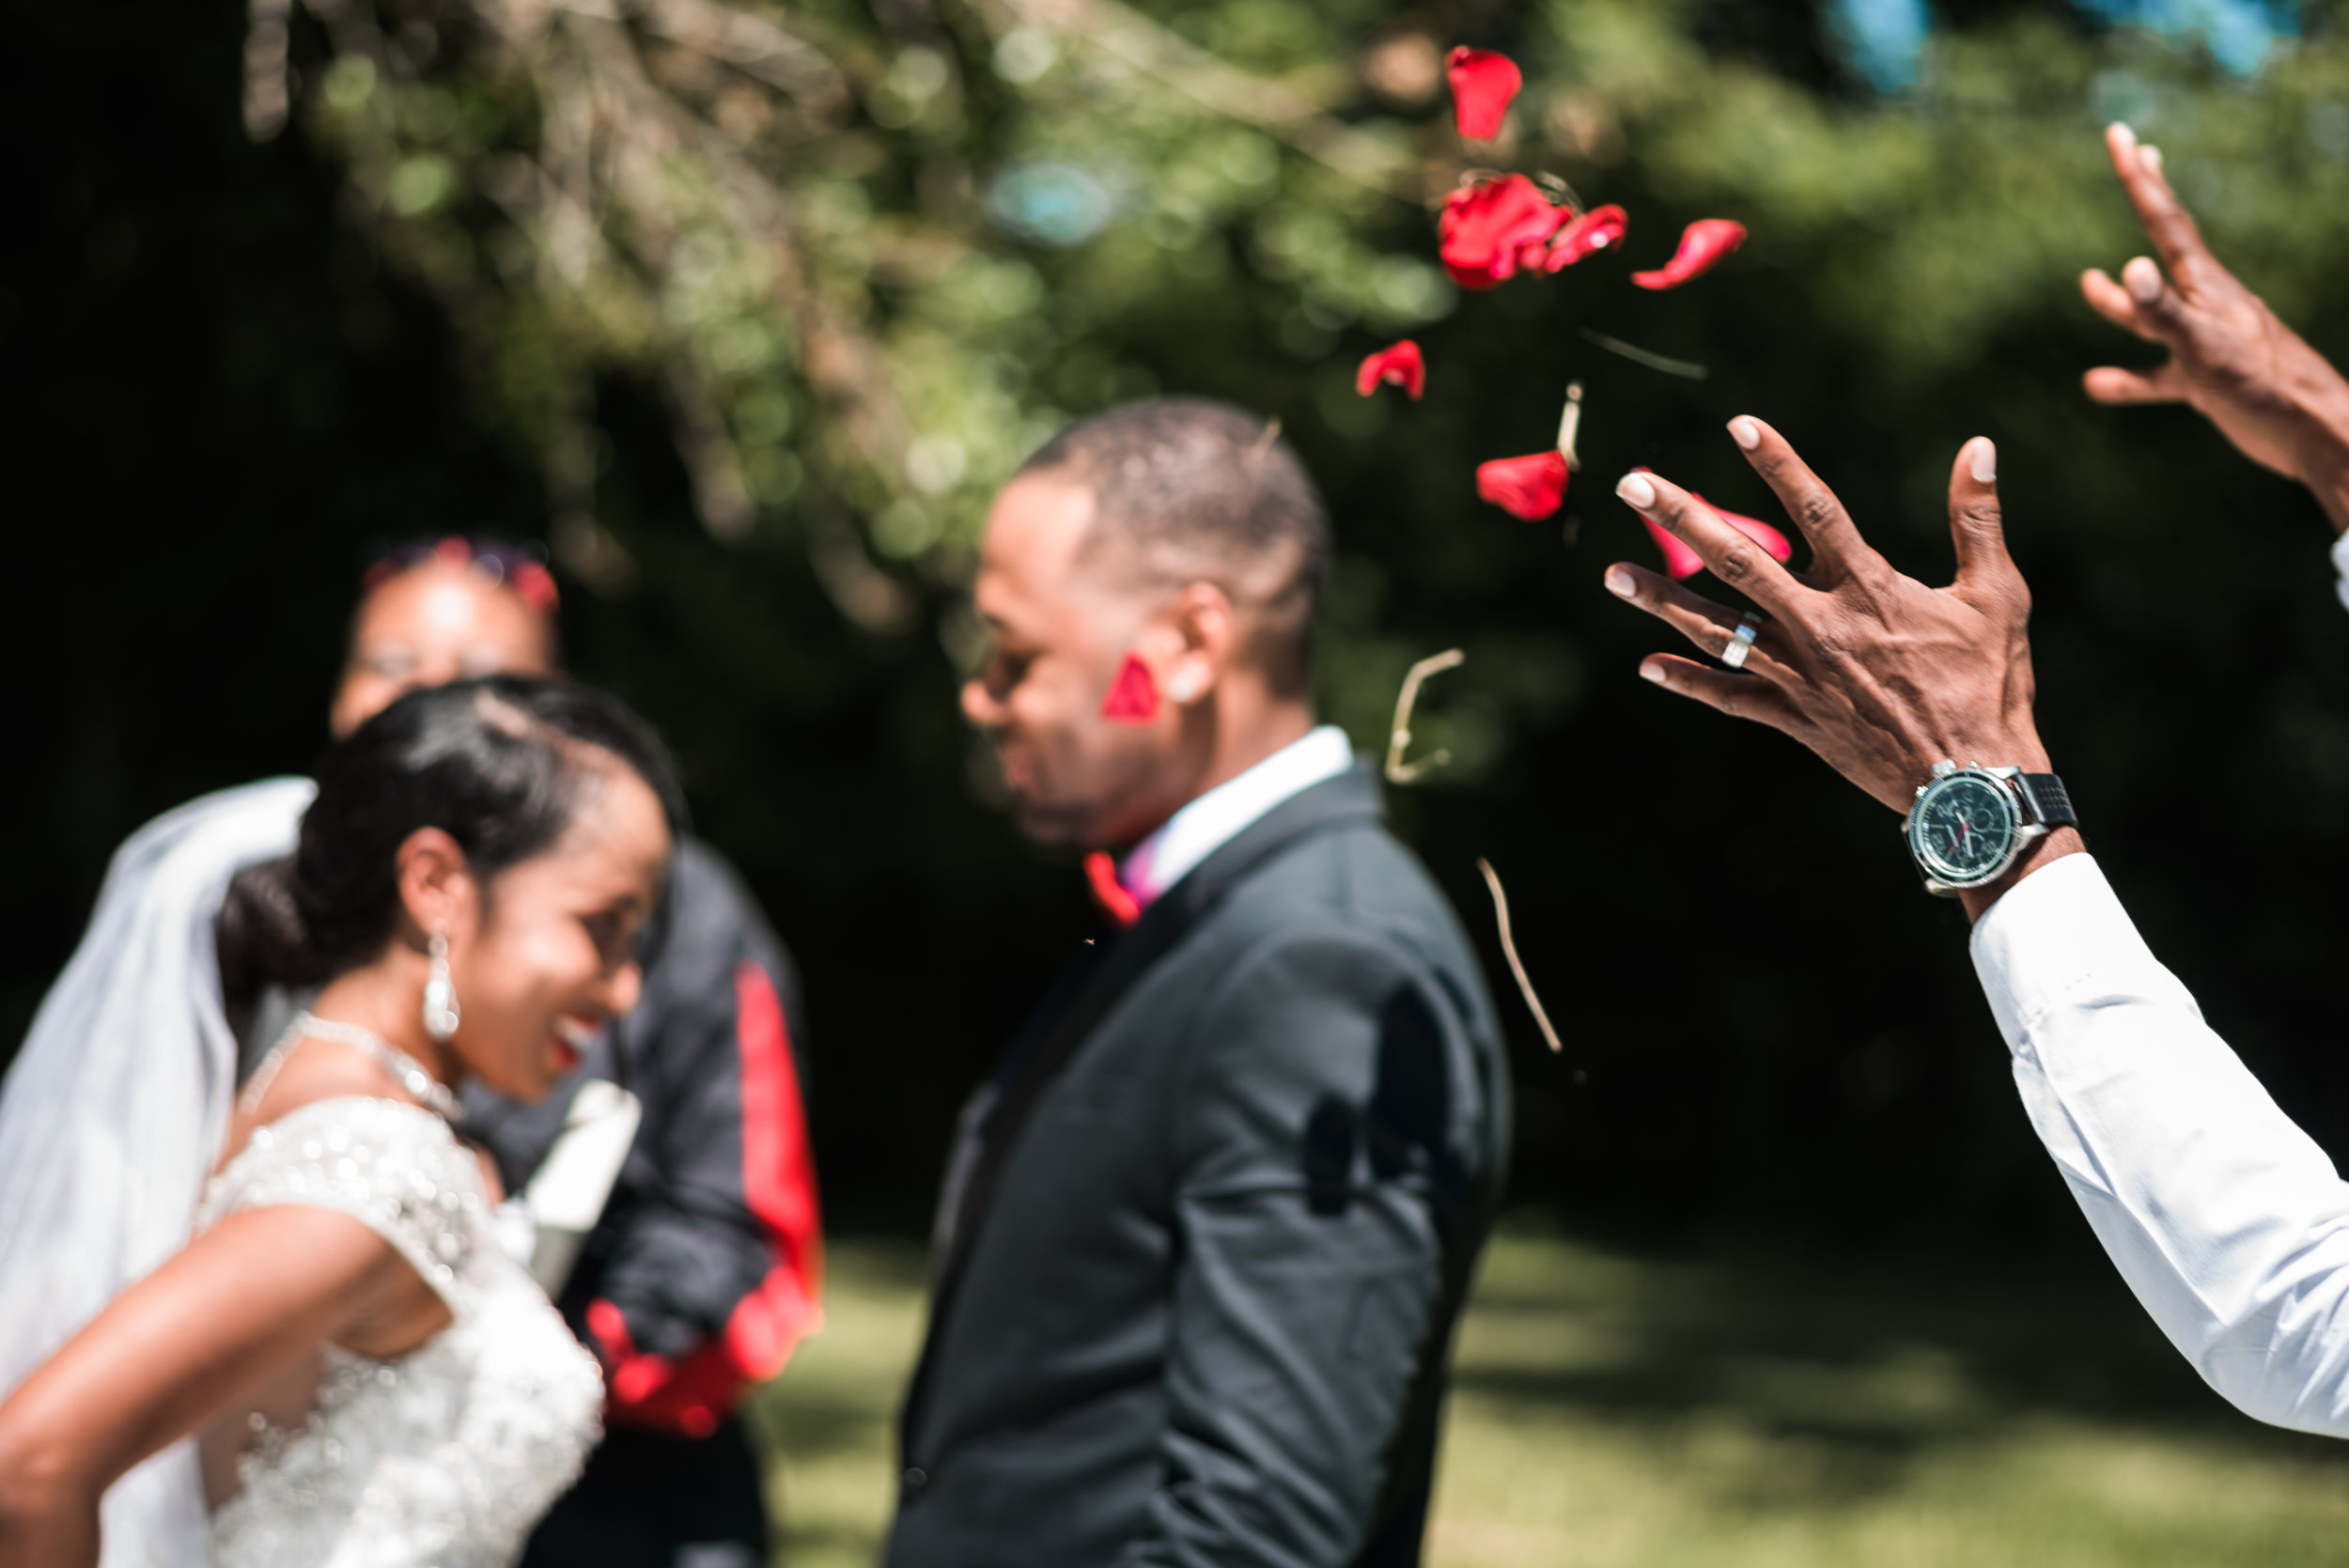 st-louis-wedding-photographer-creve-coeur-lake-16.jpg